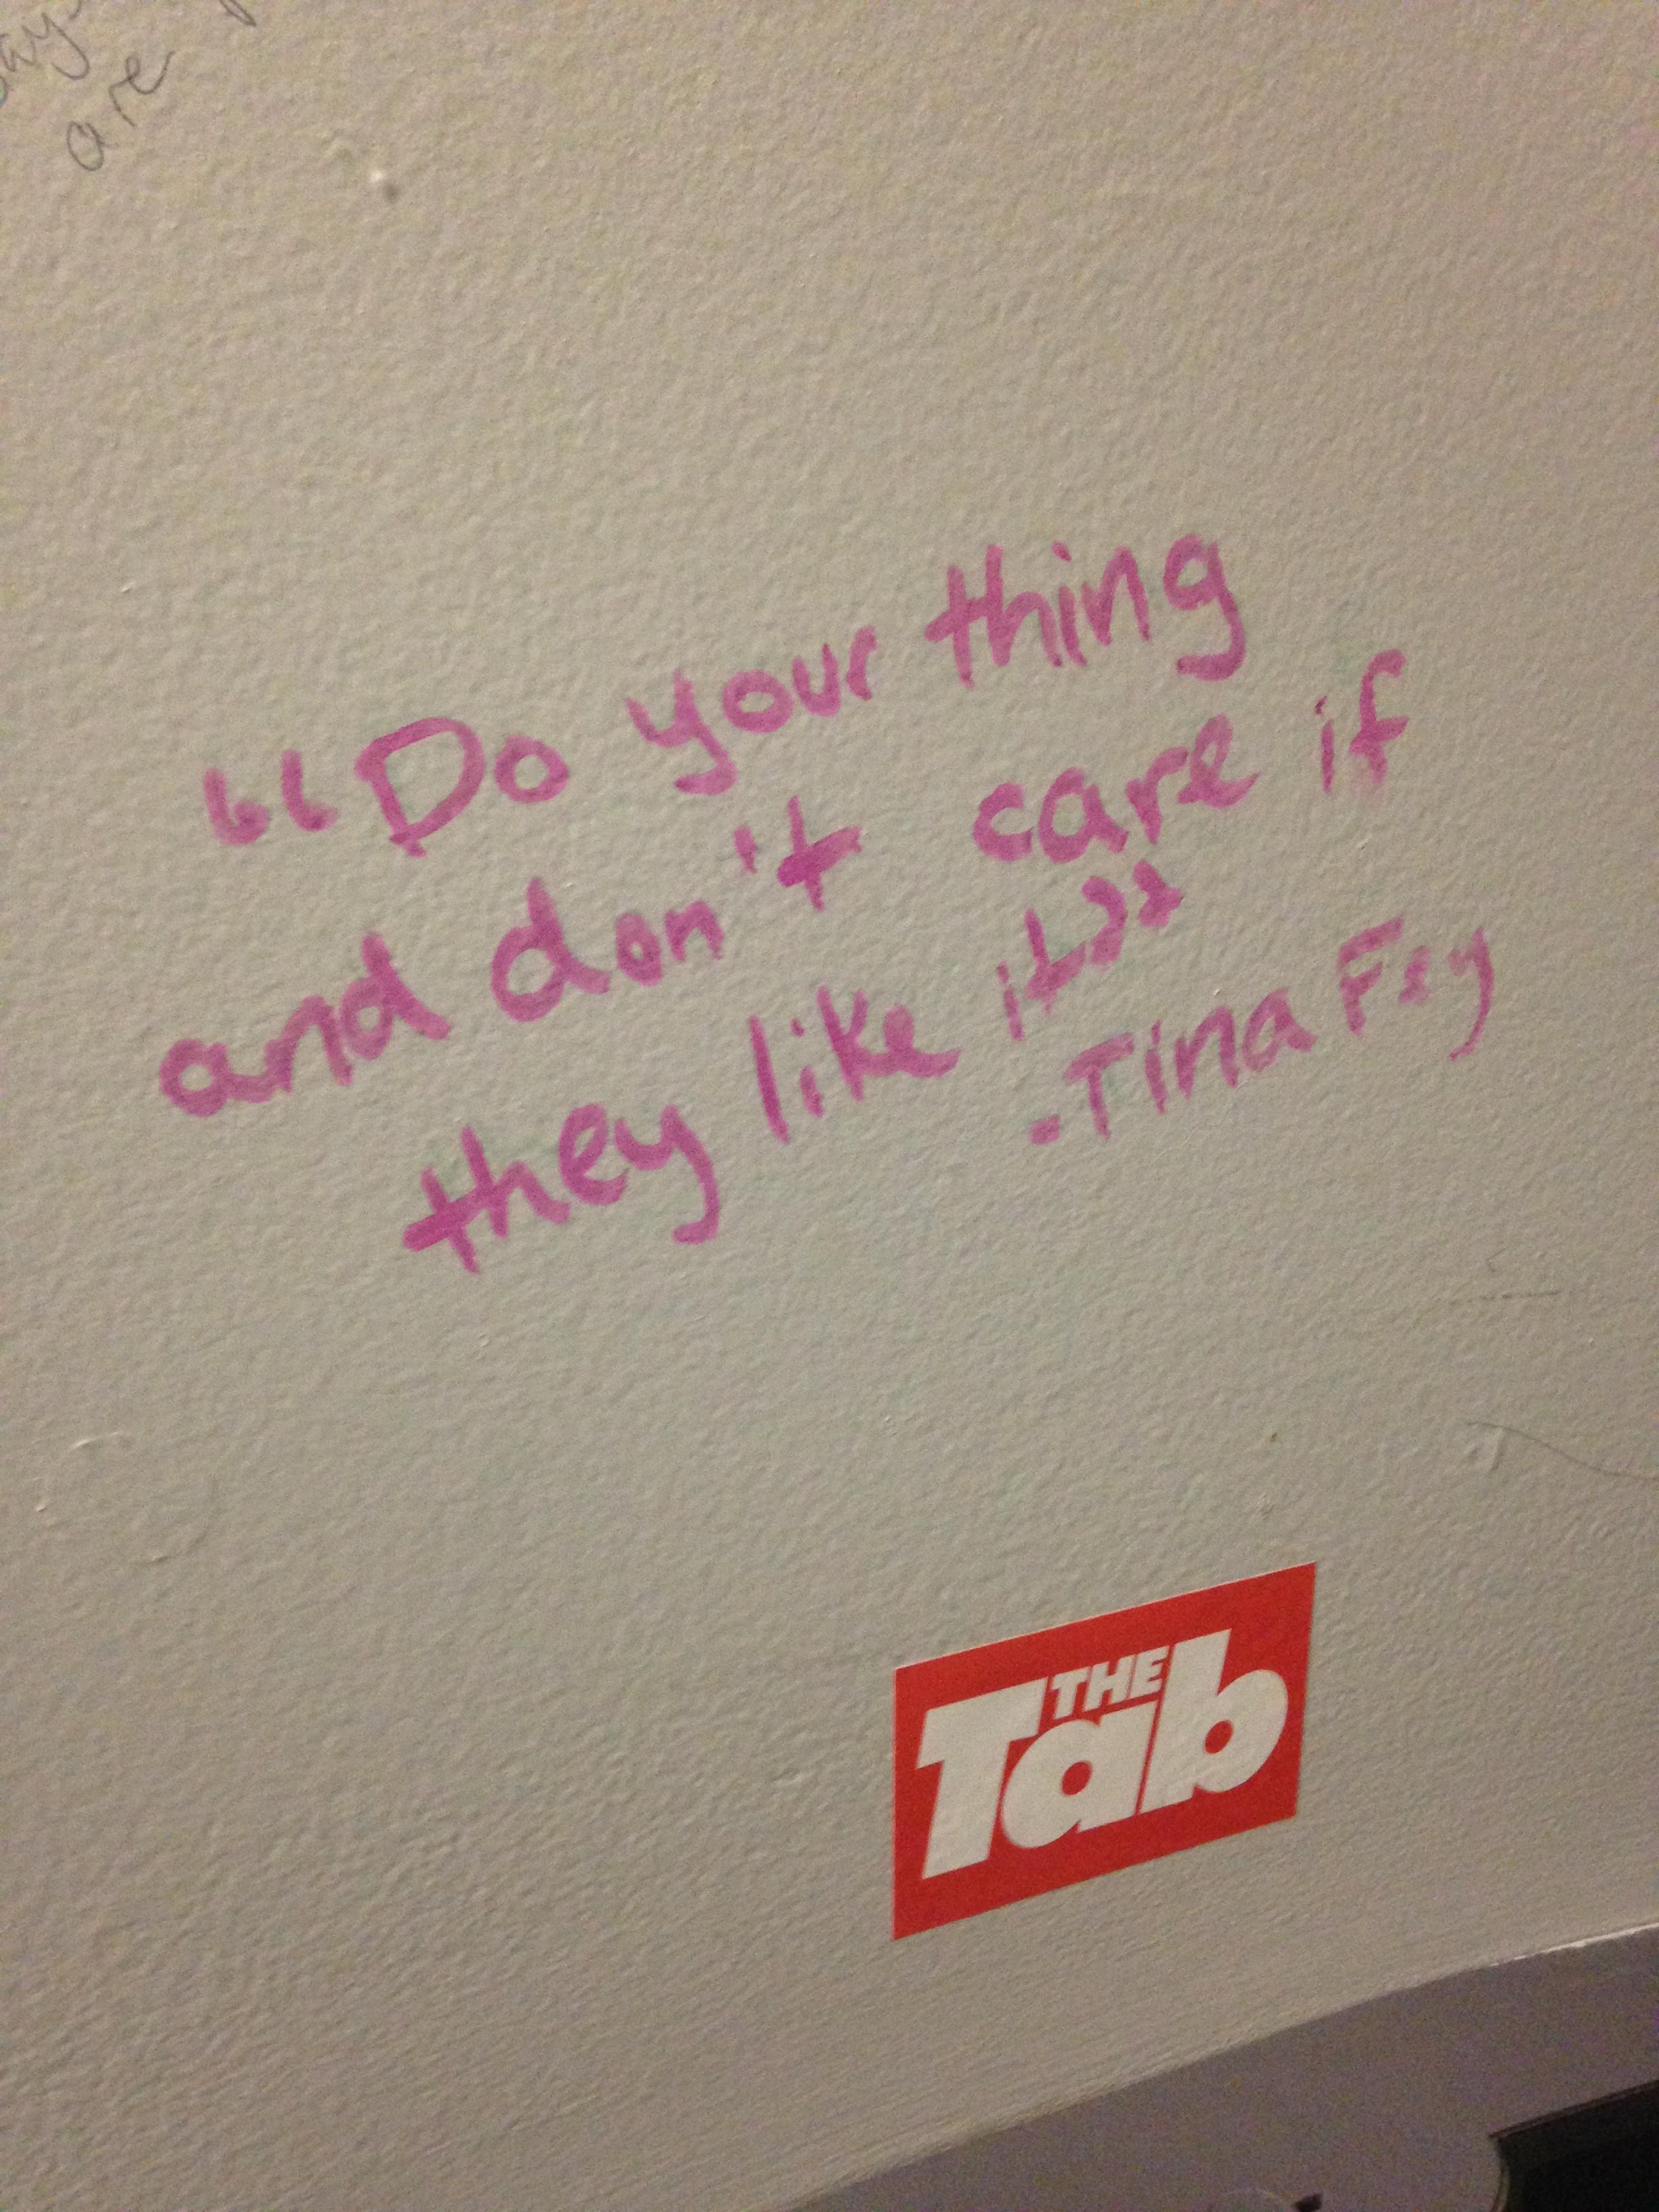 Bathroom Stall Poems the finest bathroom stall graffiti at rutgers